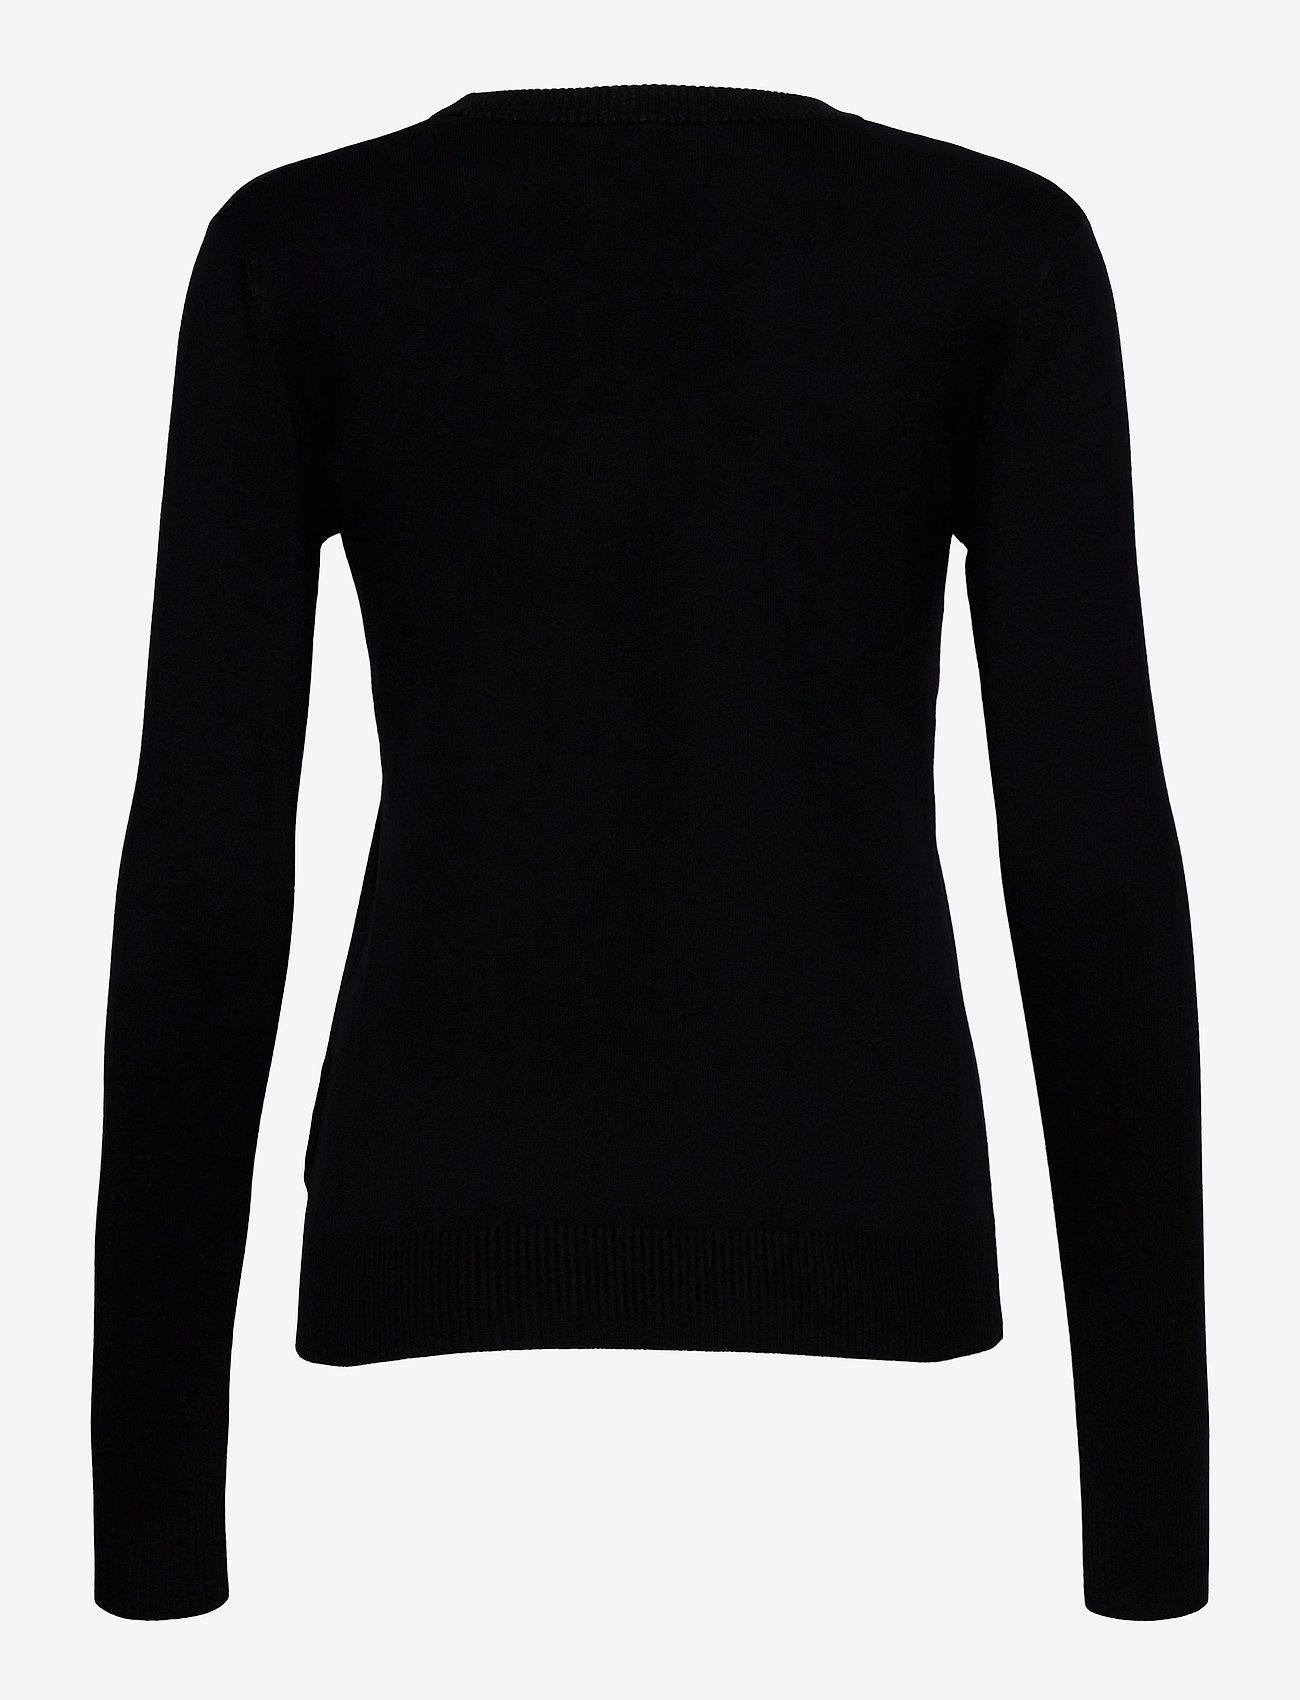 GUESS Jeans - ELVIRE RN LS SWTR - långärmade toppar - jet black a996 - 1